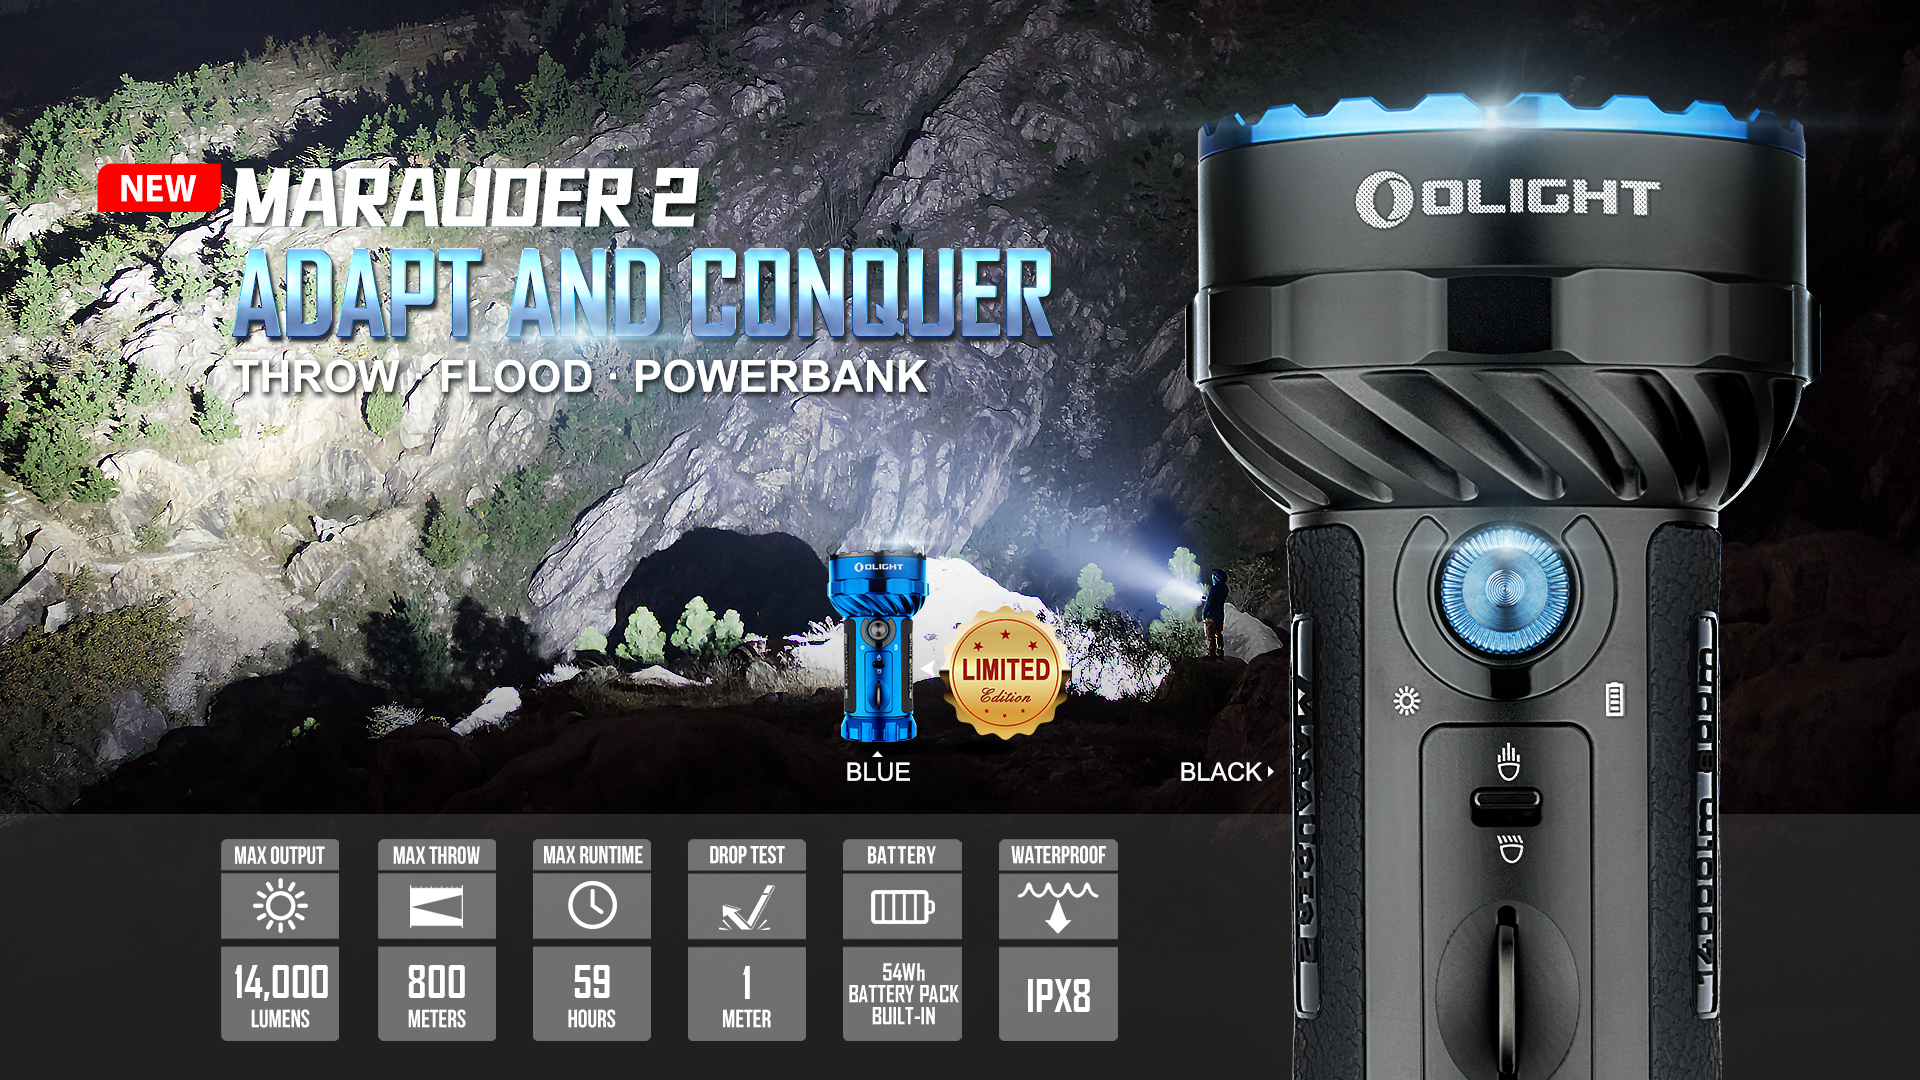 Olight Marauder 2 Most Powerful Flashlight Adapt and Conquer